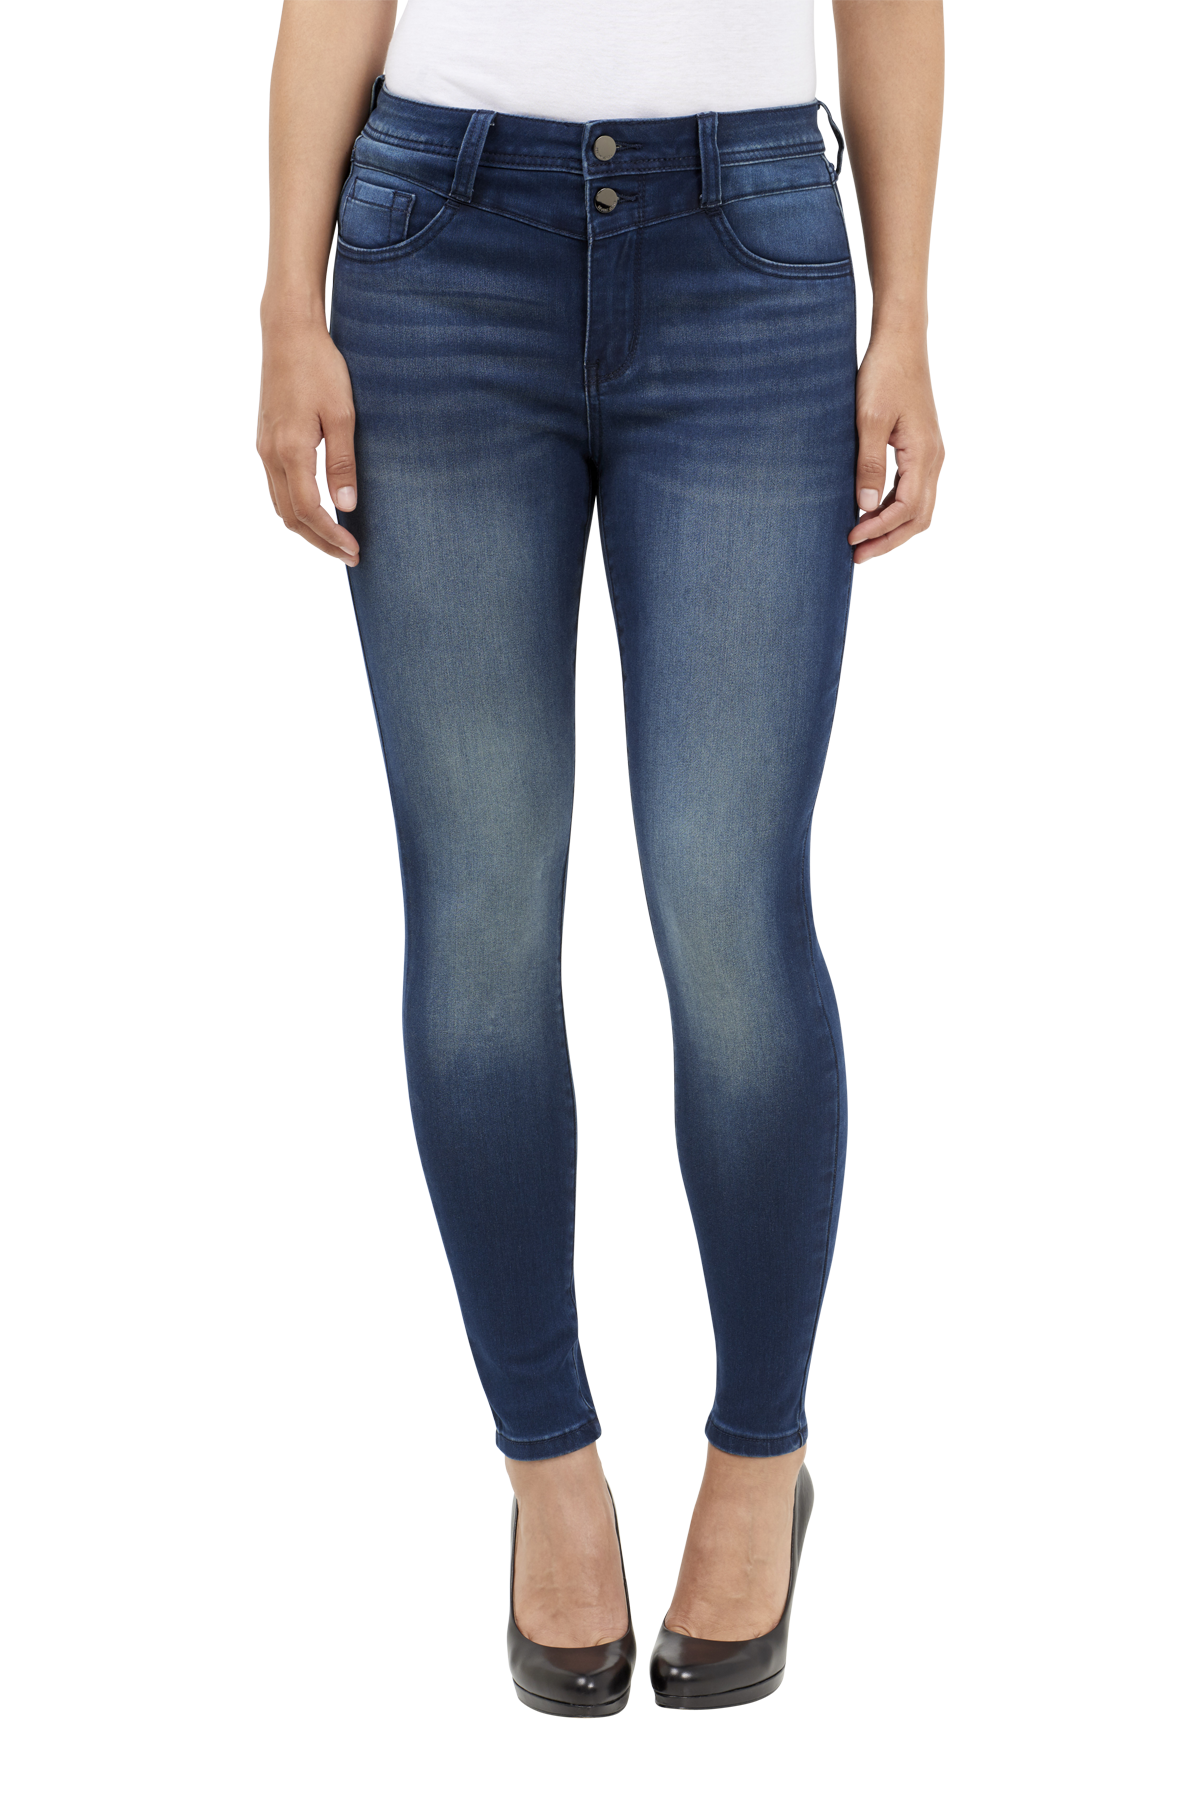 Seven7 Jeans Hi Rise Legging